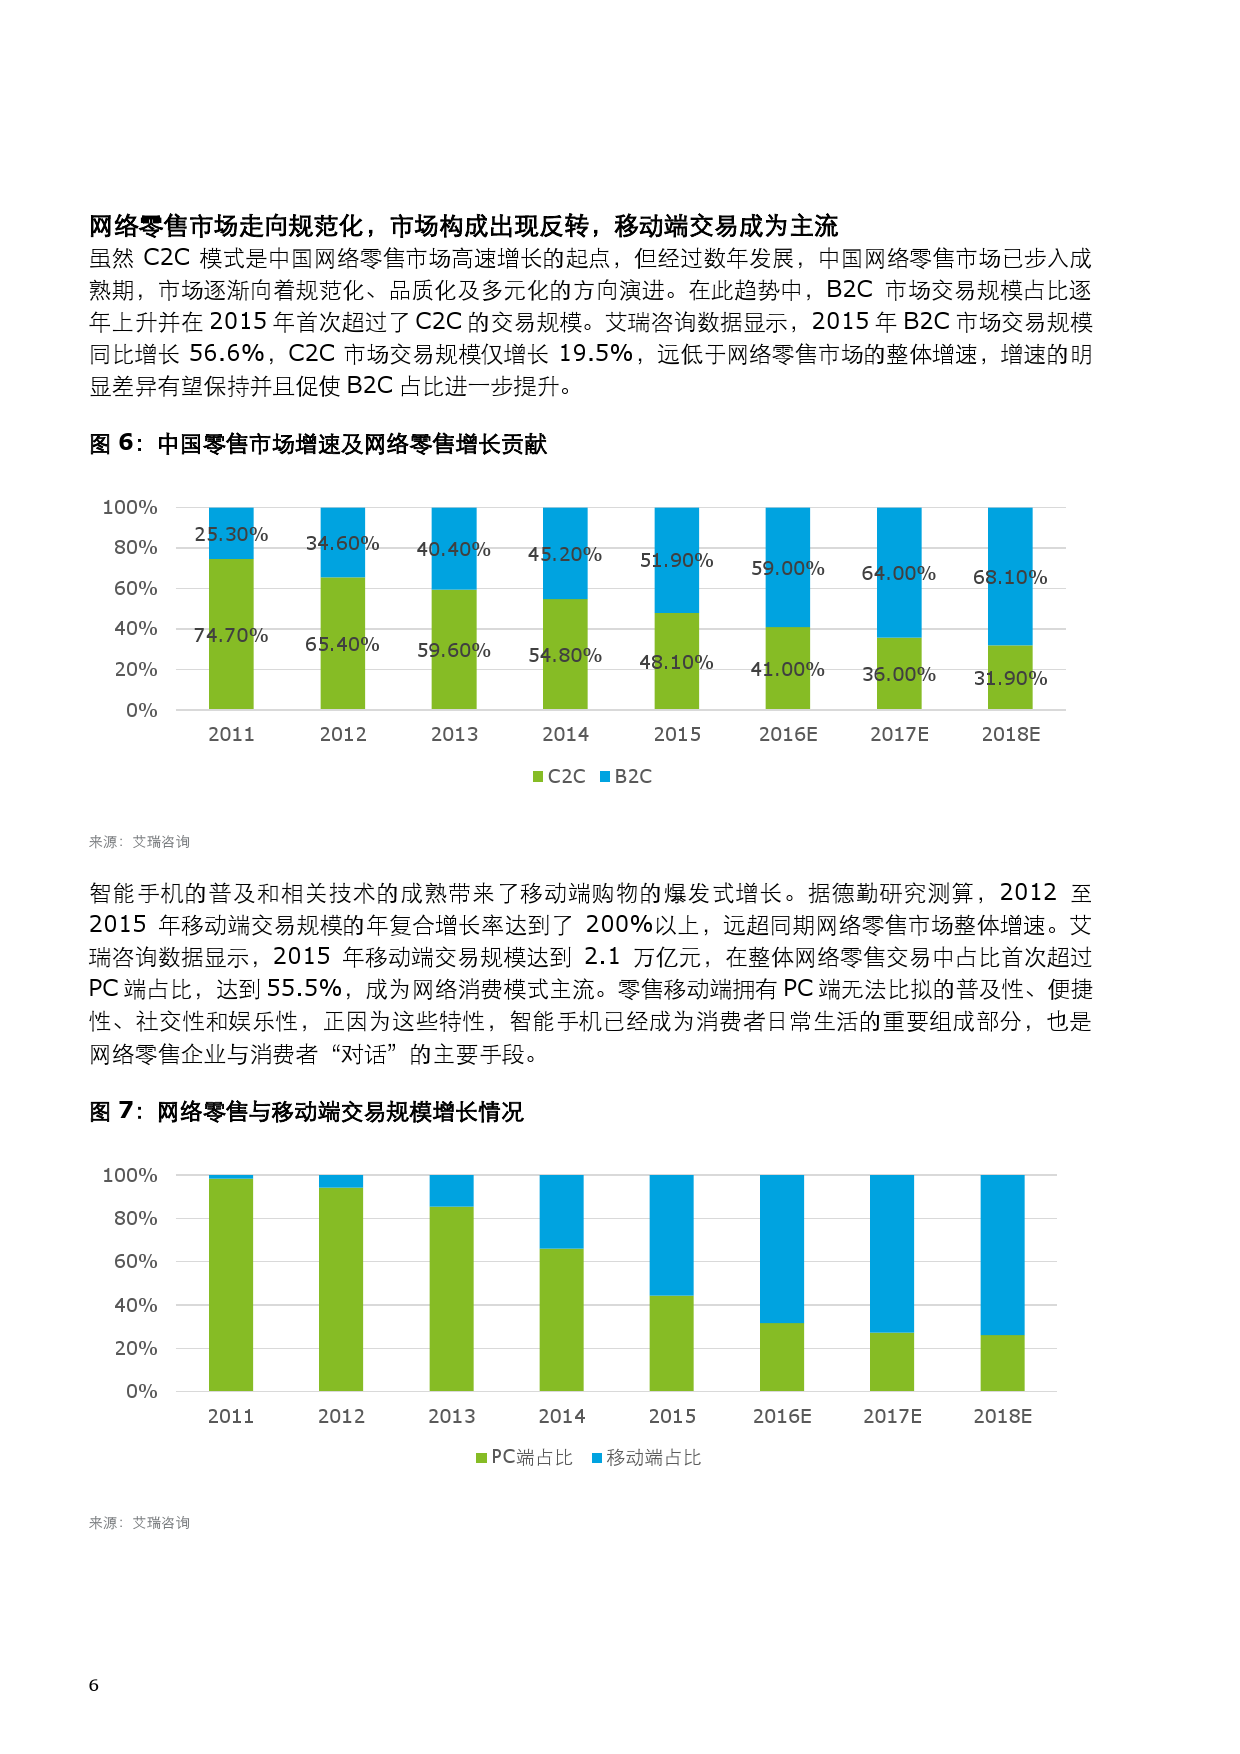 2016%e4%b8%ad%e5%9b%bd%e7%bd%91%e7%bb%9c%e9%9b%b6%e5%94%ae%e5%b8%82%e5%9c%ba%e5%8f%91%e5%b1%95%e7%a0%94%e7%a9%b6%e6%8a%a5%e5%91%8a_000010